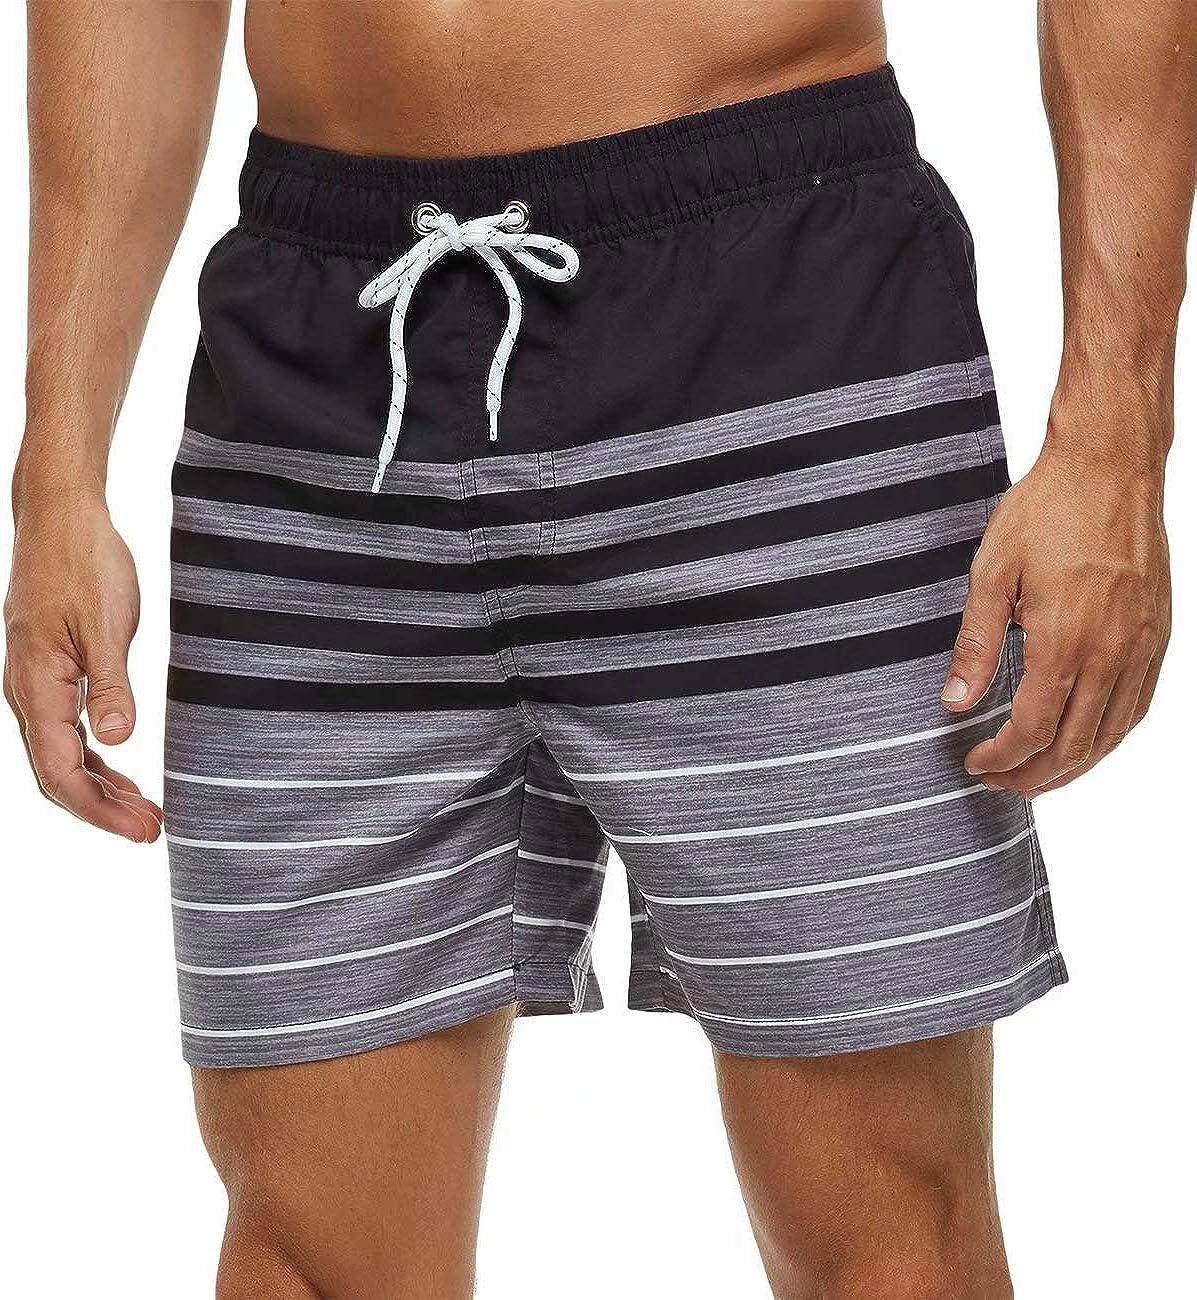 Tyhengta Mens Printed Swim Trunks Quick Dry Beach Shorts with Mesh Lining